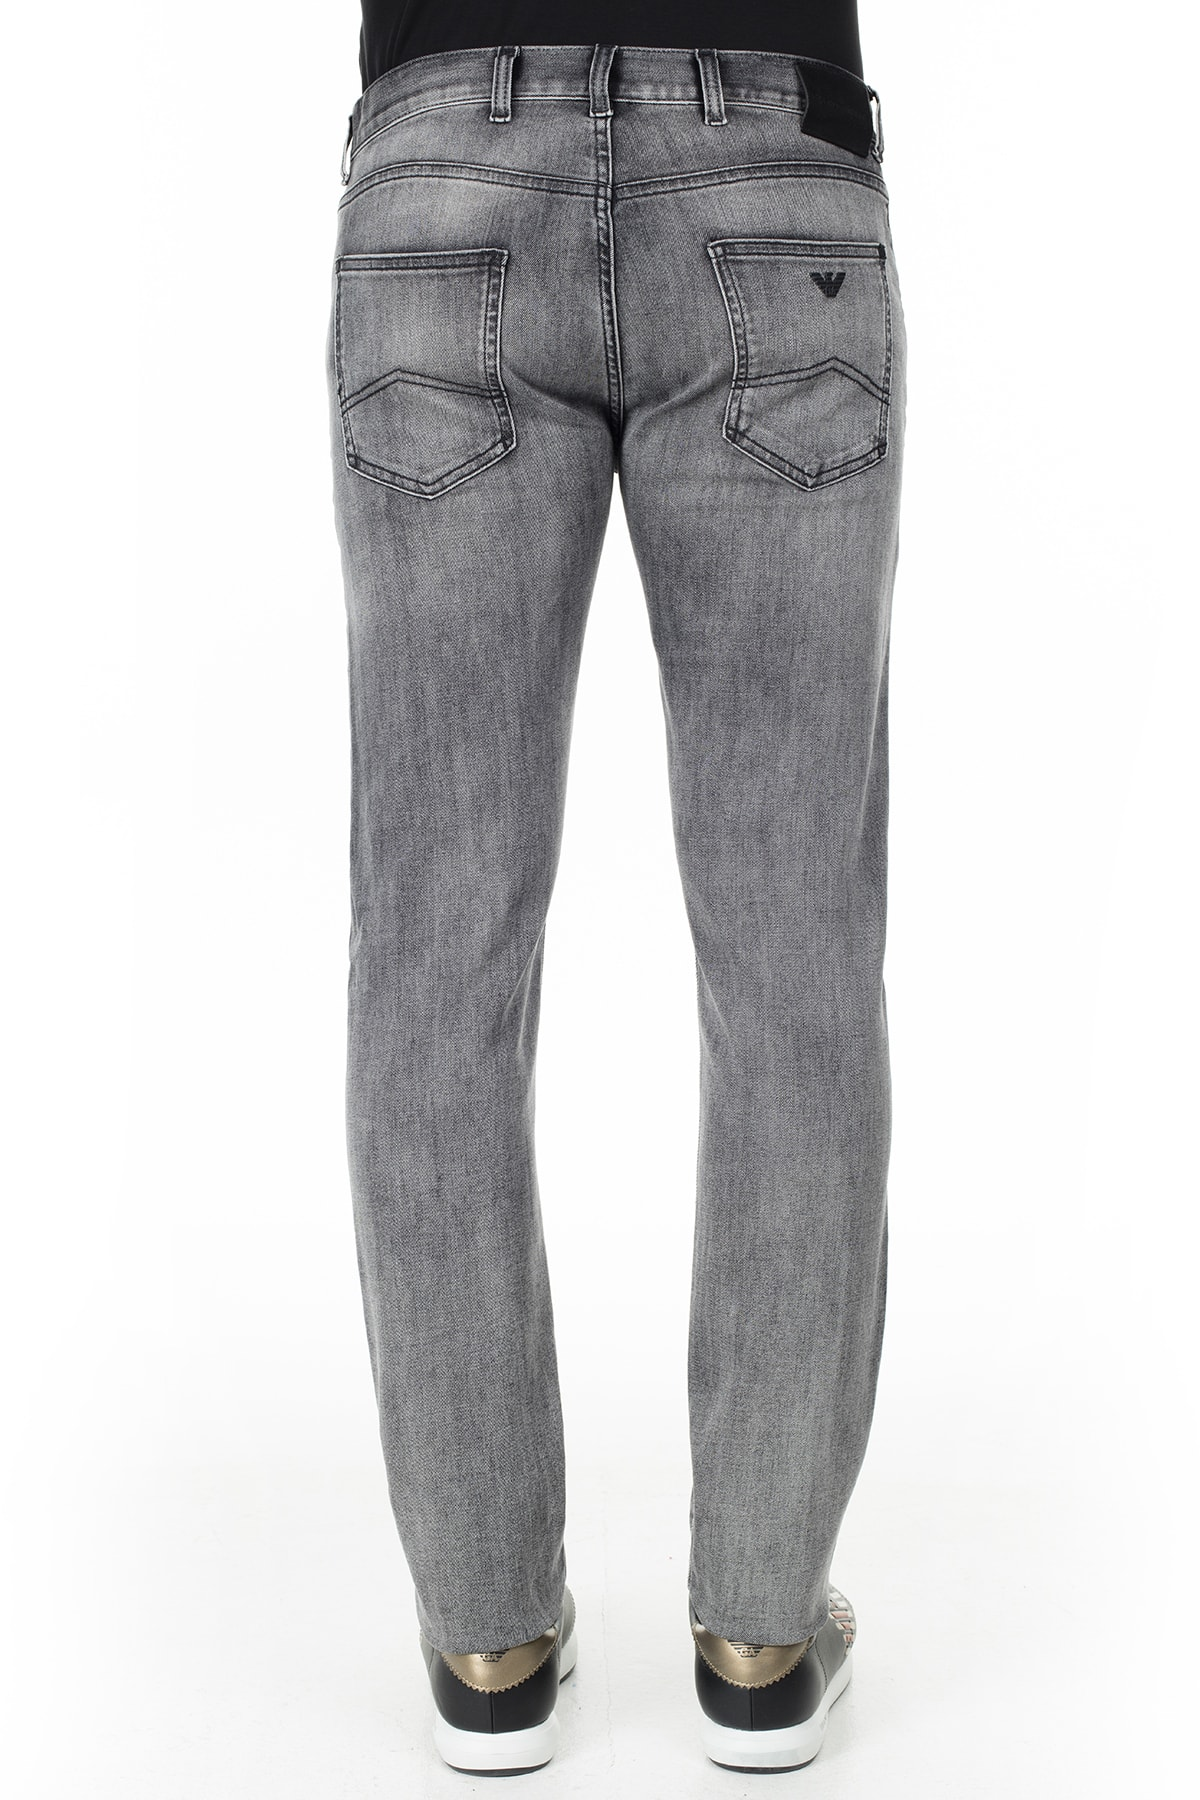 Emporio Armani J10 Jeans Erkek Kot Pantolon S 6G1J10 1D6Mz 0644 S 6G1J10 1D6MZ 0644 3